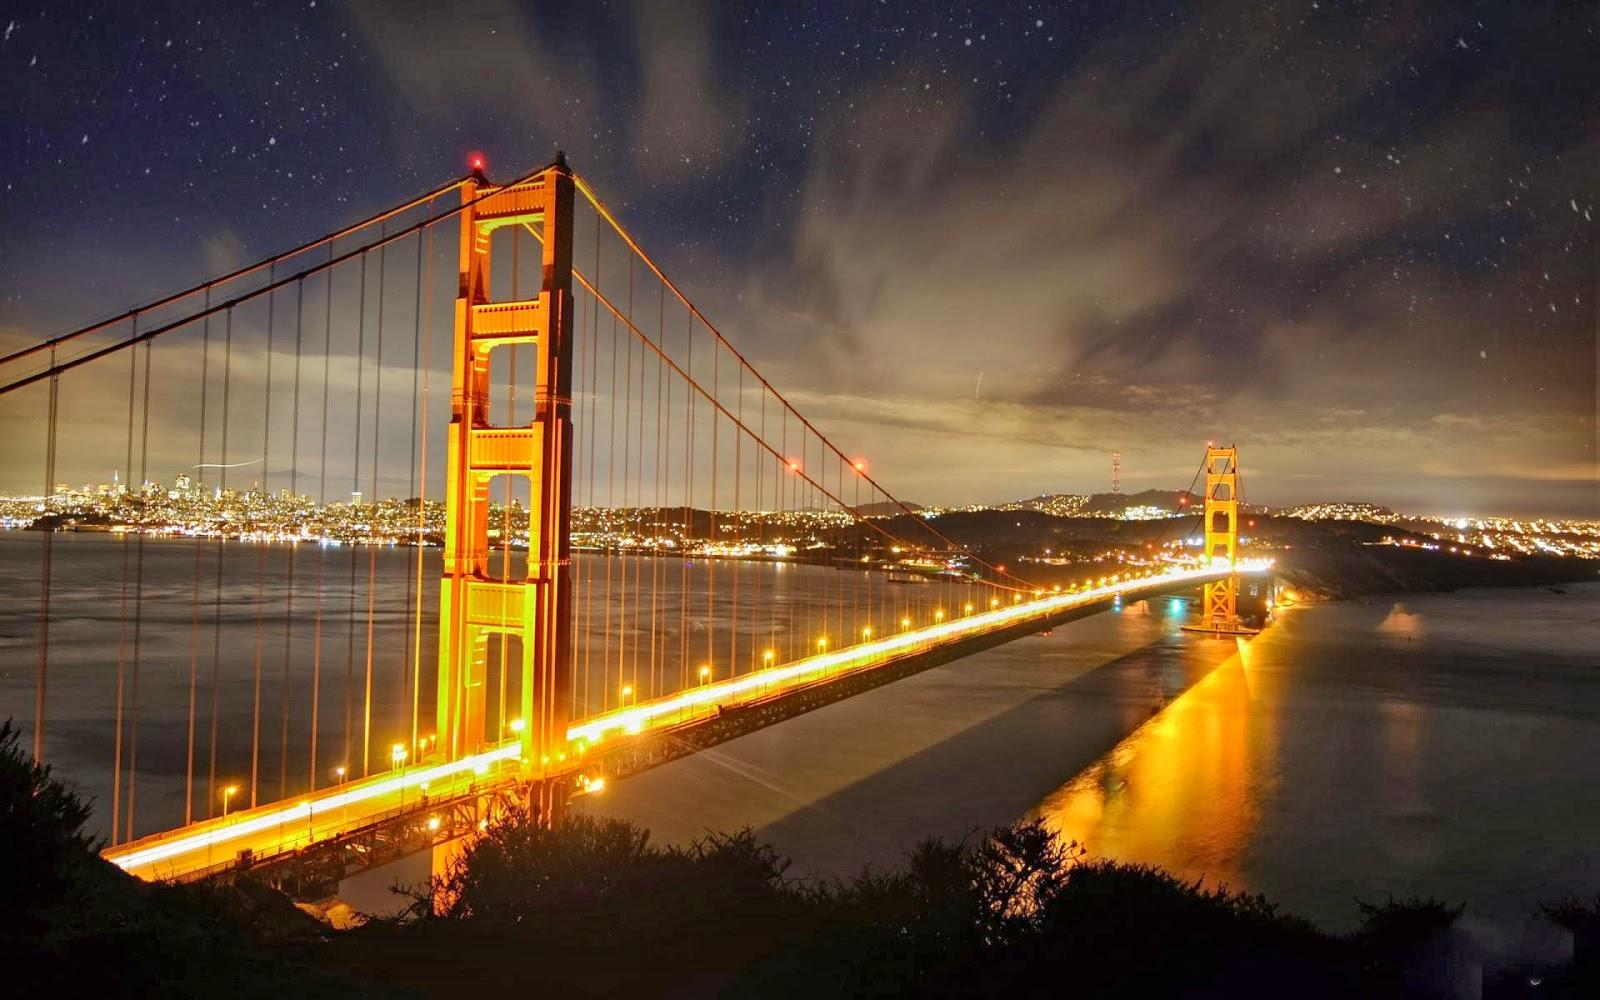 Bestwall Golden Gate Bridge Nights Wallpapers